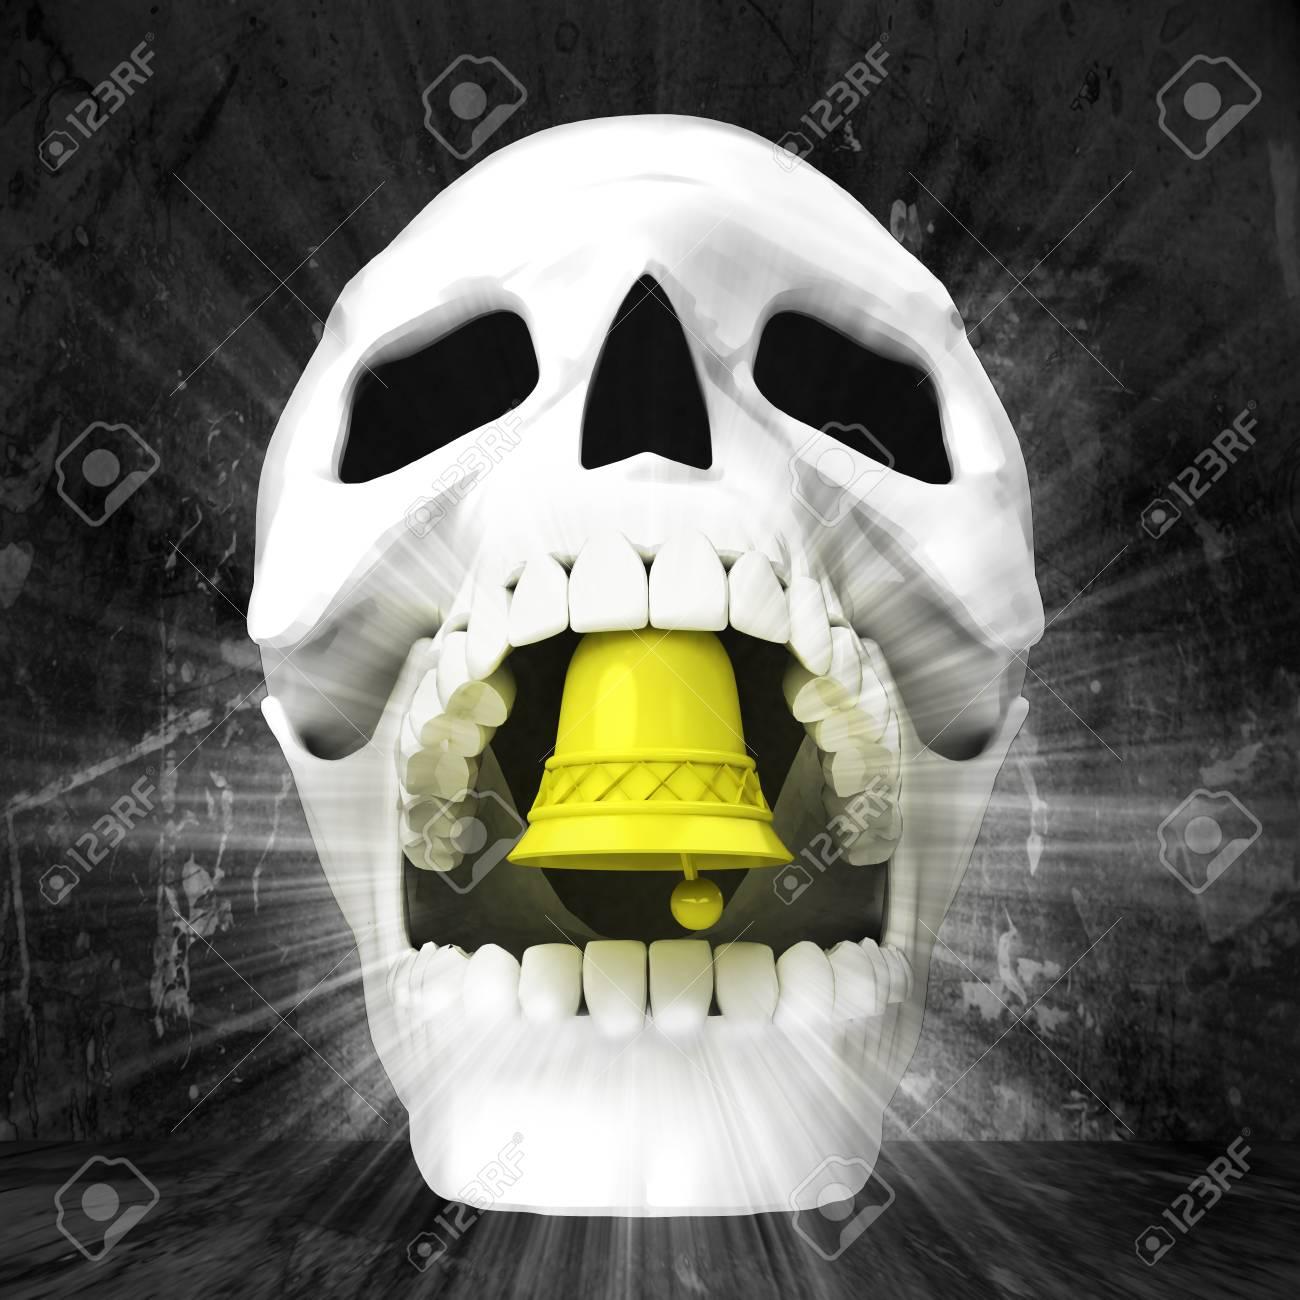 human skull with in jaws on grunge illustration Stock Illustration - 26652385